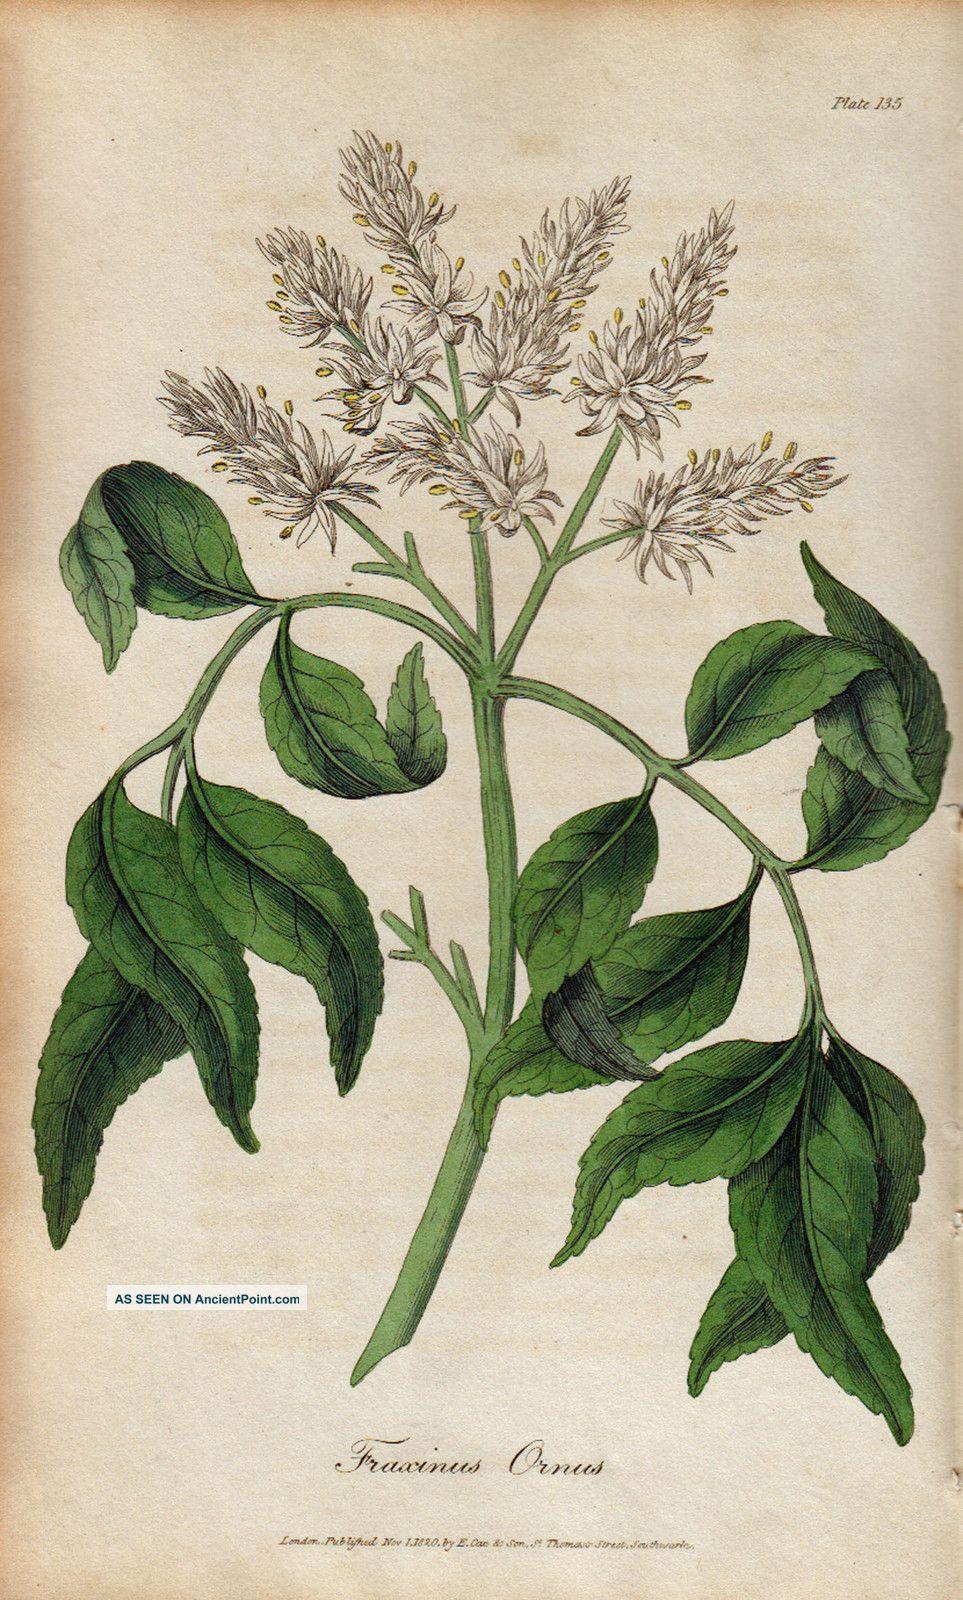 Herbs Herbal Medical 19th Century 1820 Art Medicinal Botanical 1820 Other photo